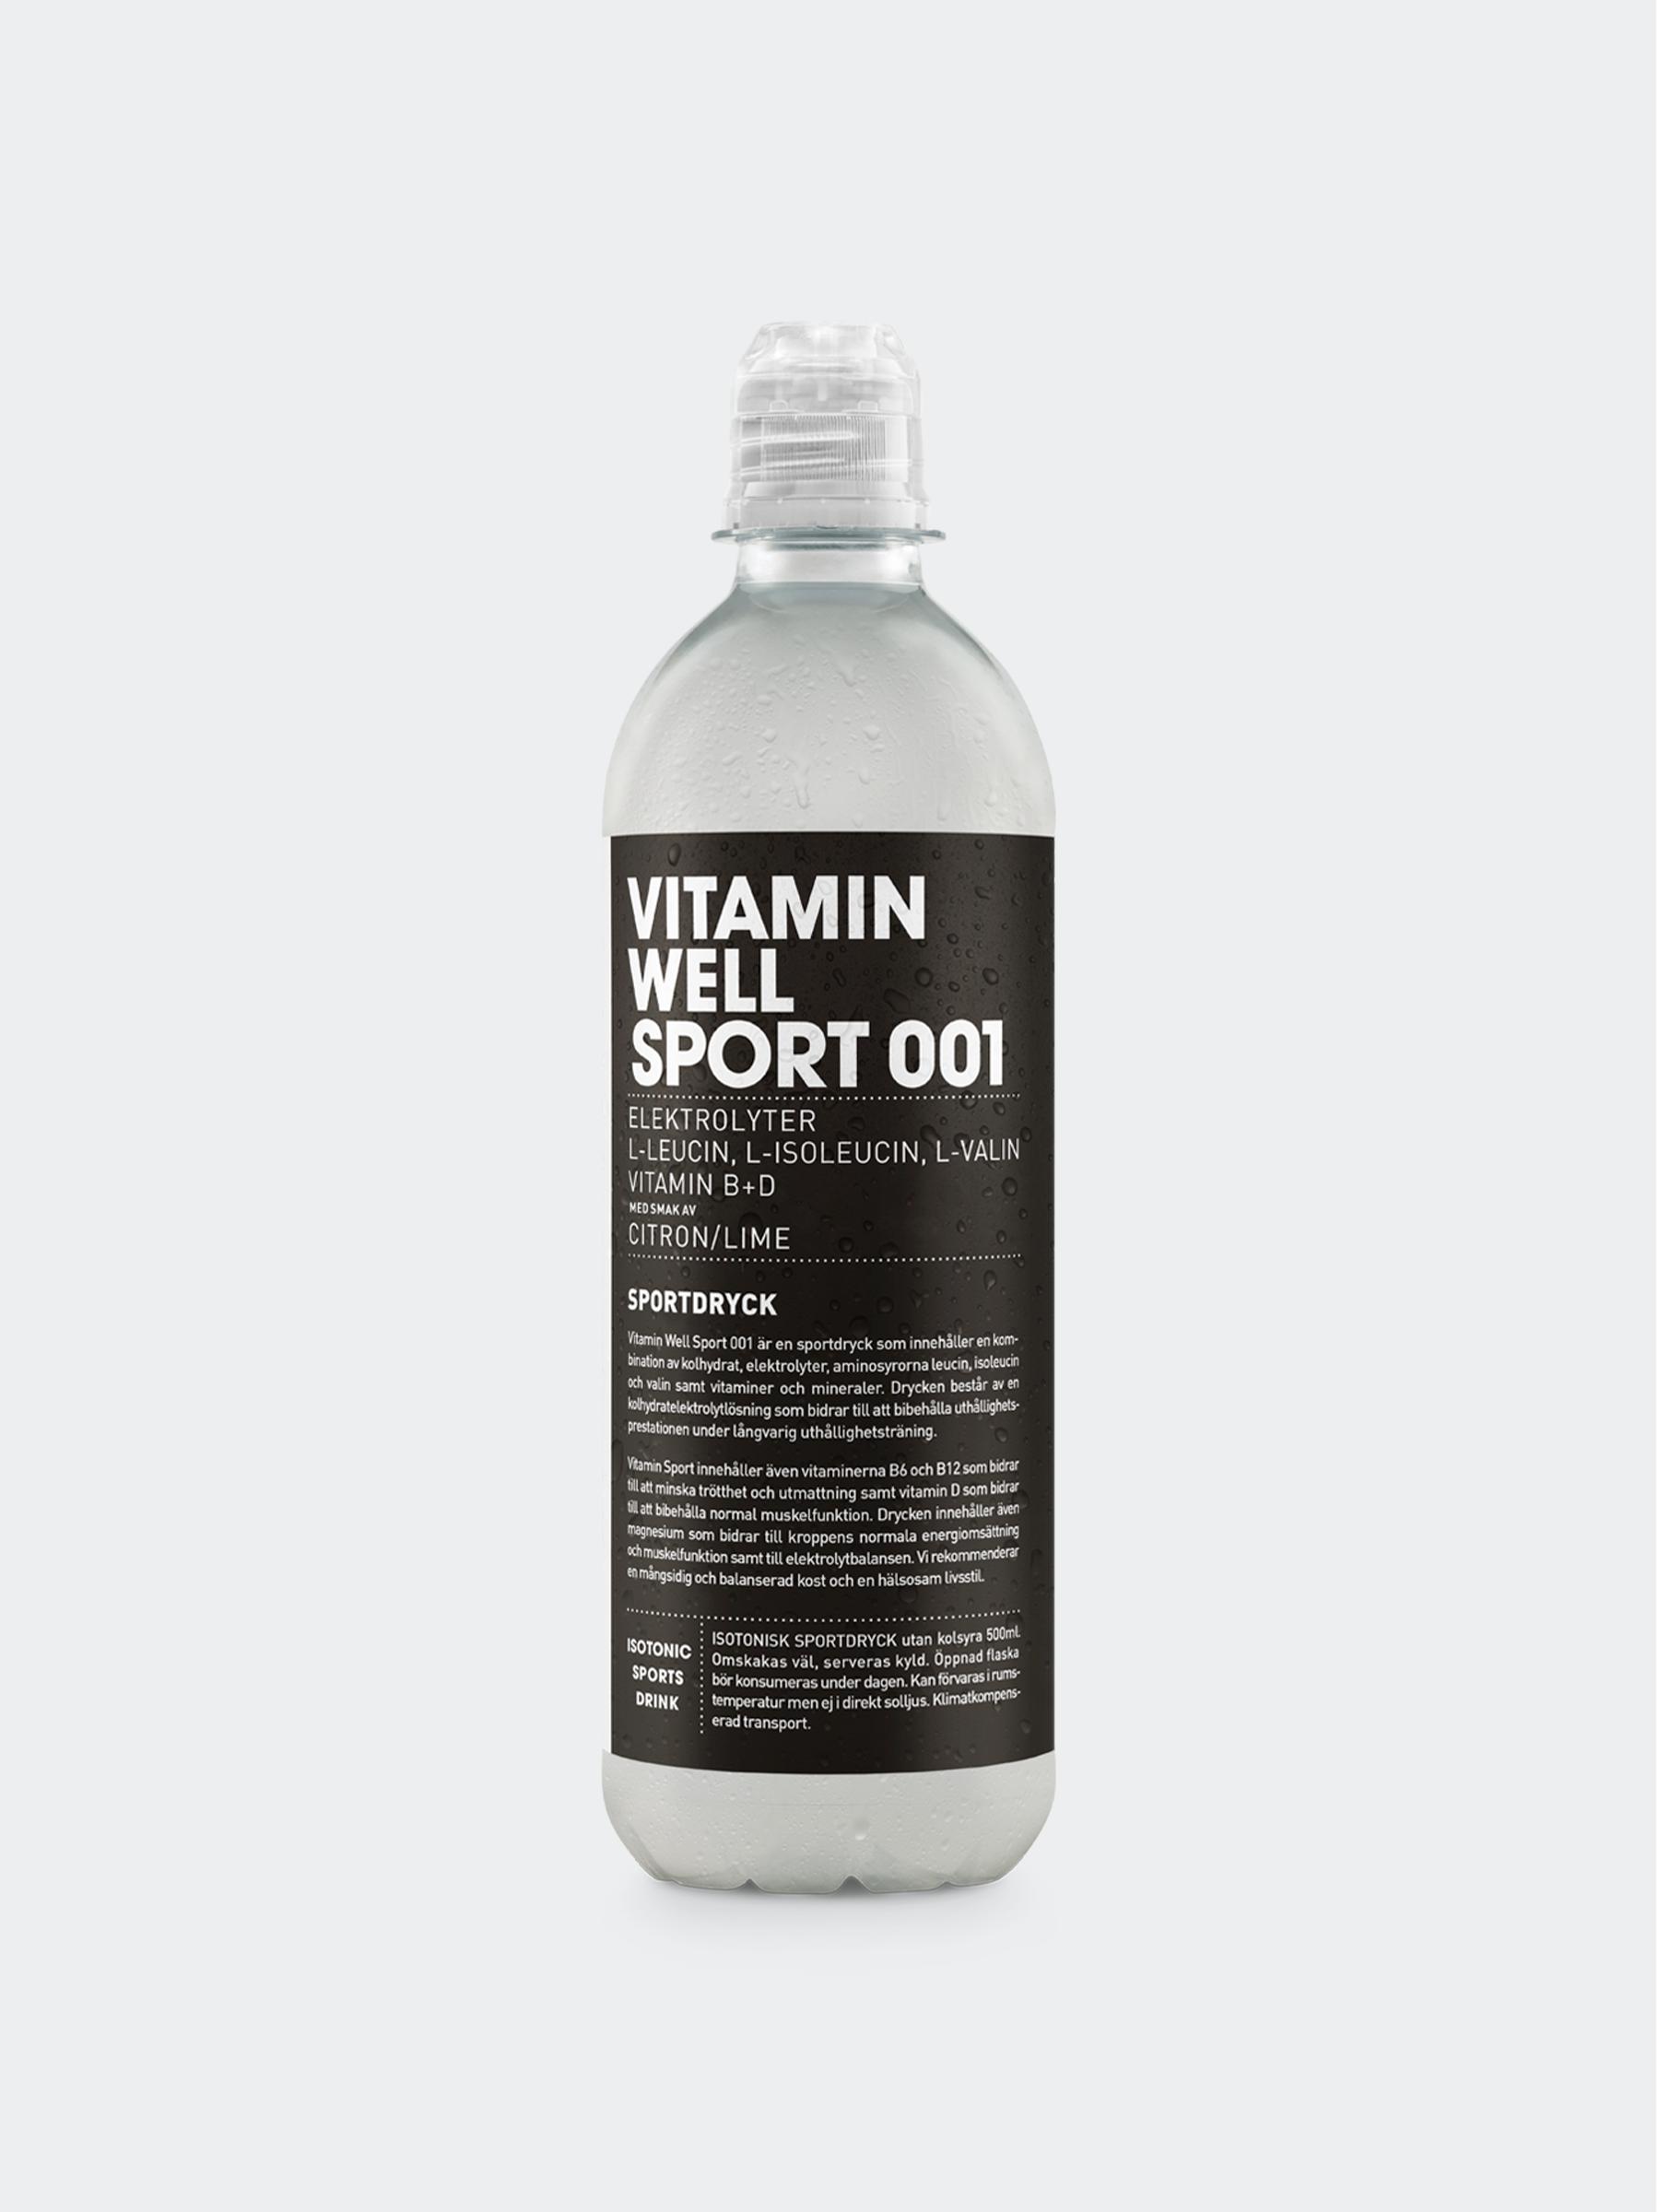 Vitamin Well Sport 001 Styck